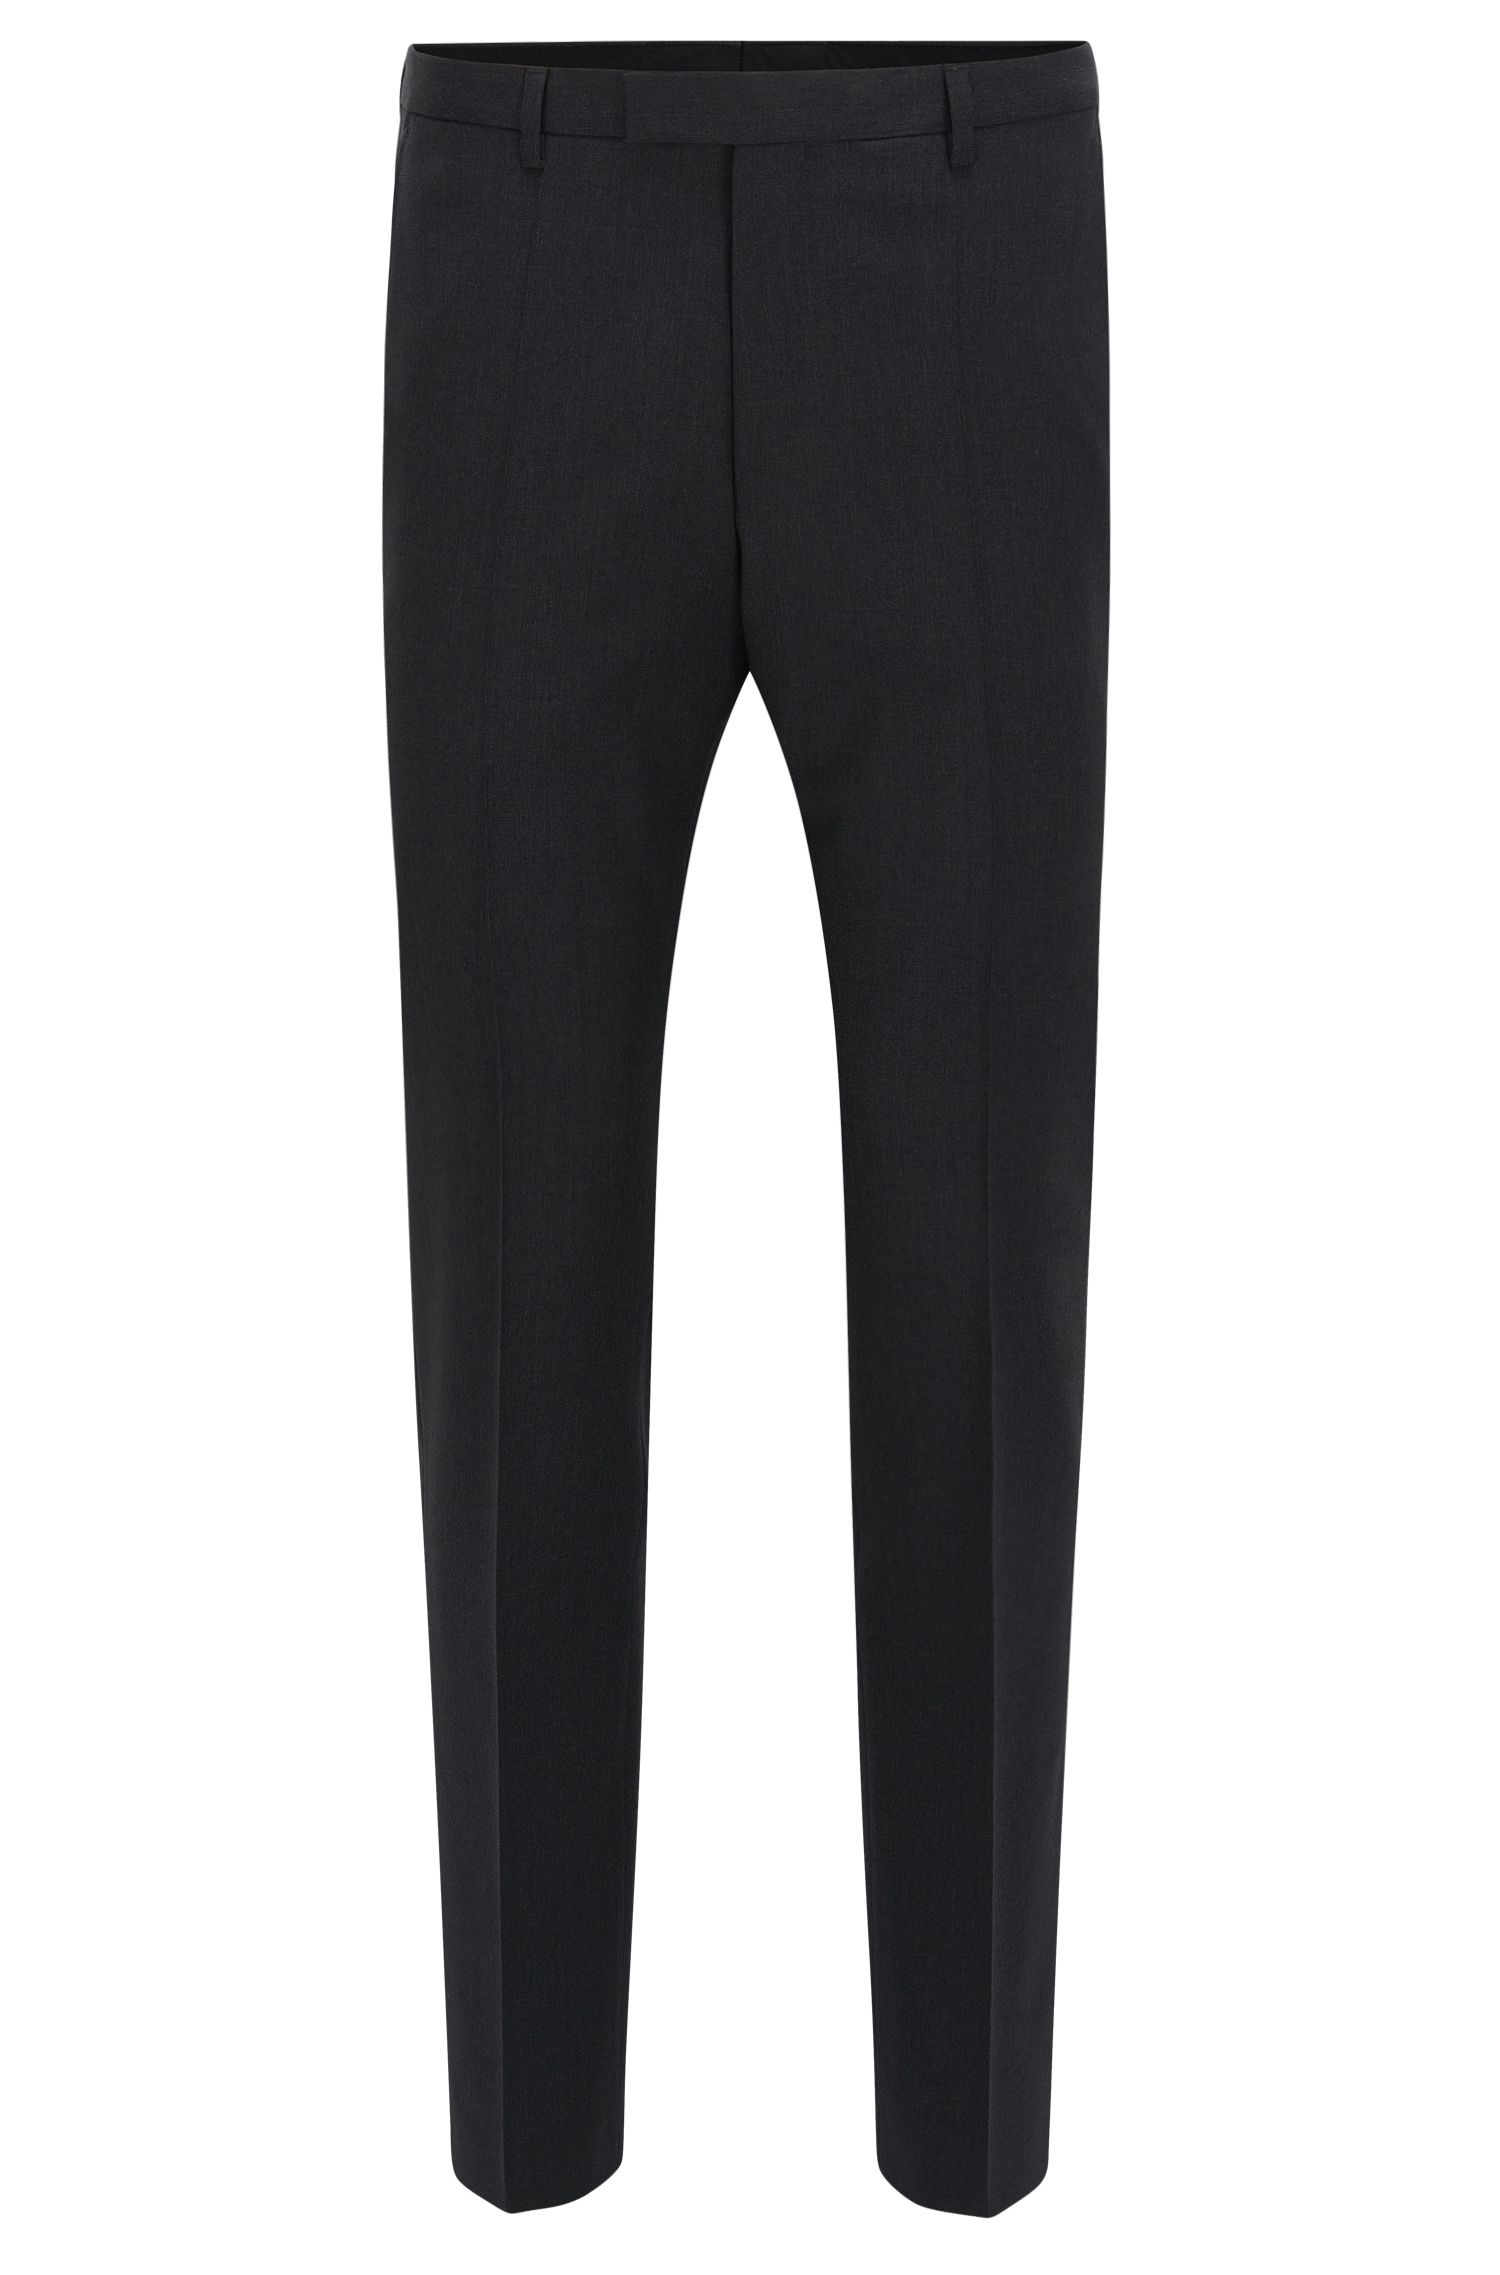 Straight-leg business trousers in virgin wool